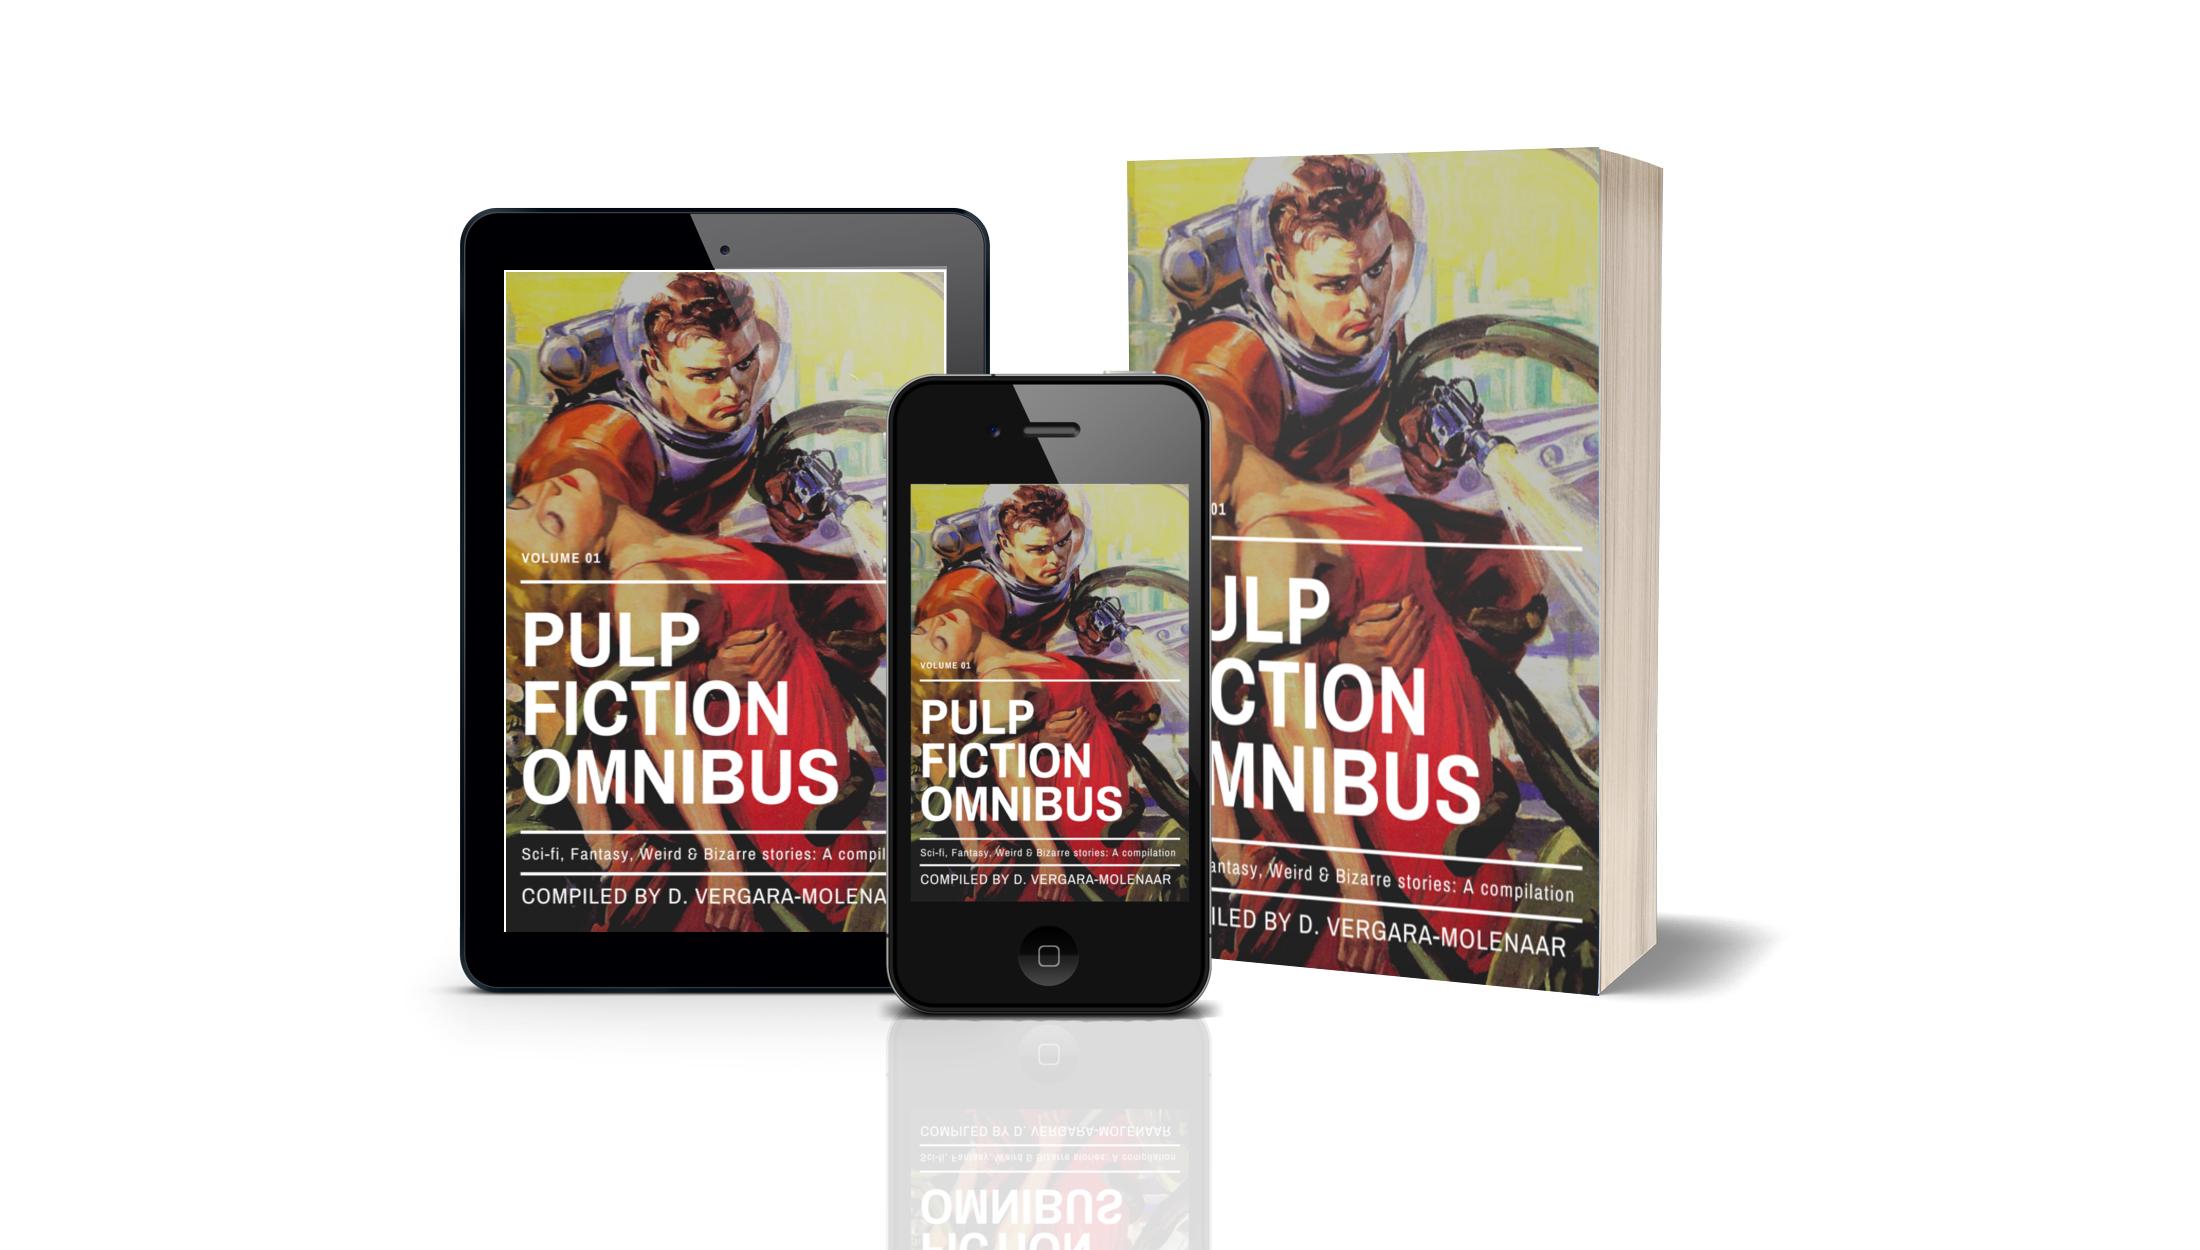 pulp fiction omnibus volume 01 - wbg